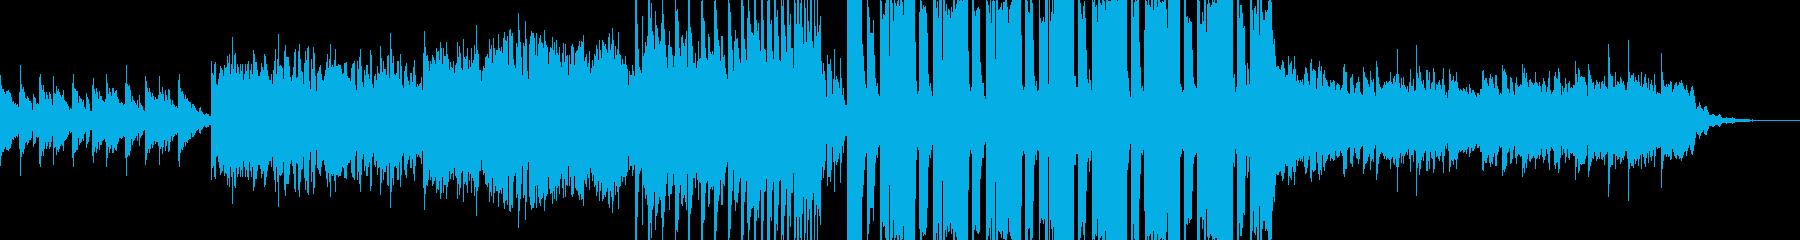 Future Pop 1の再生済みの波形